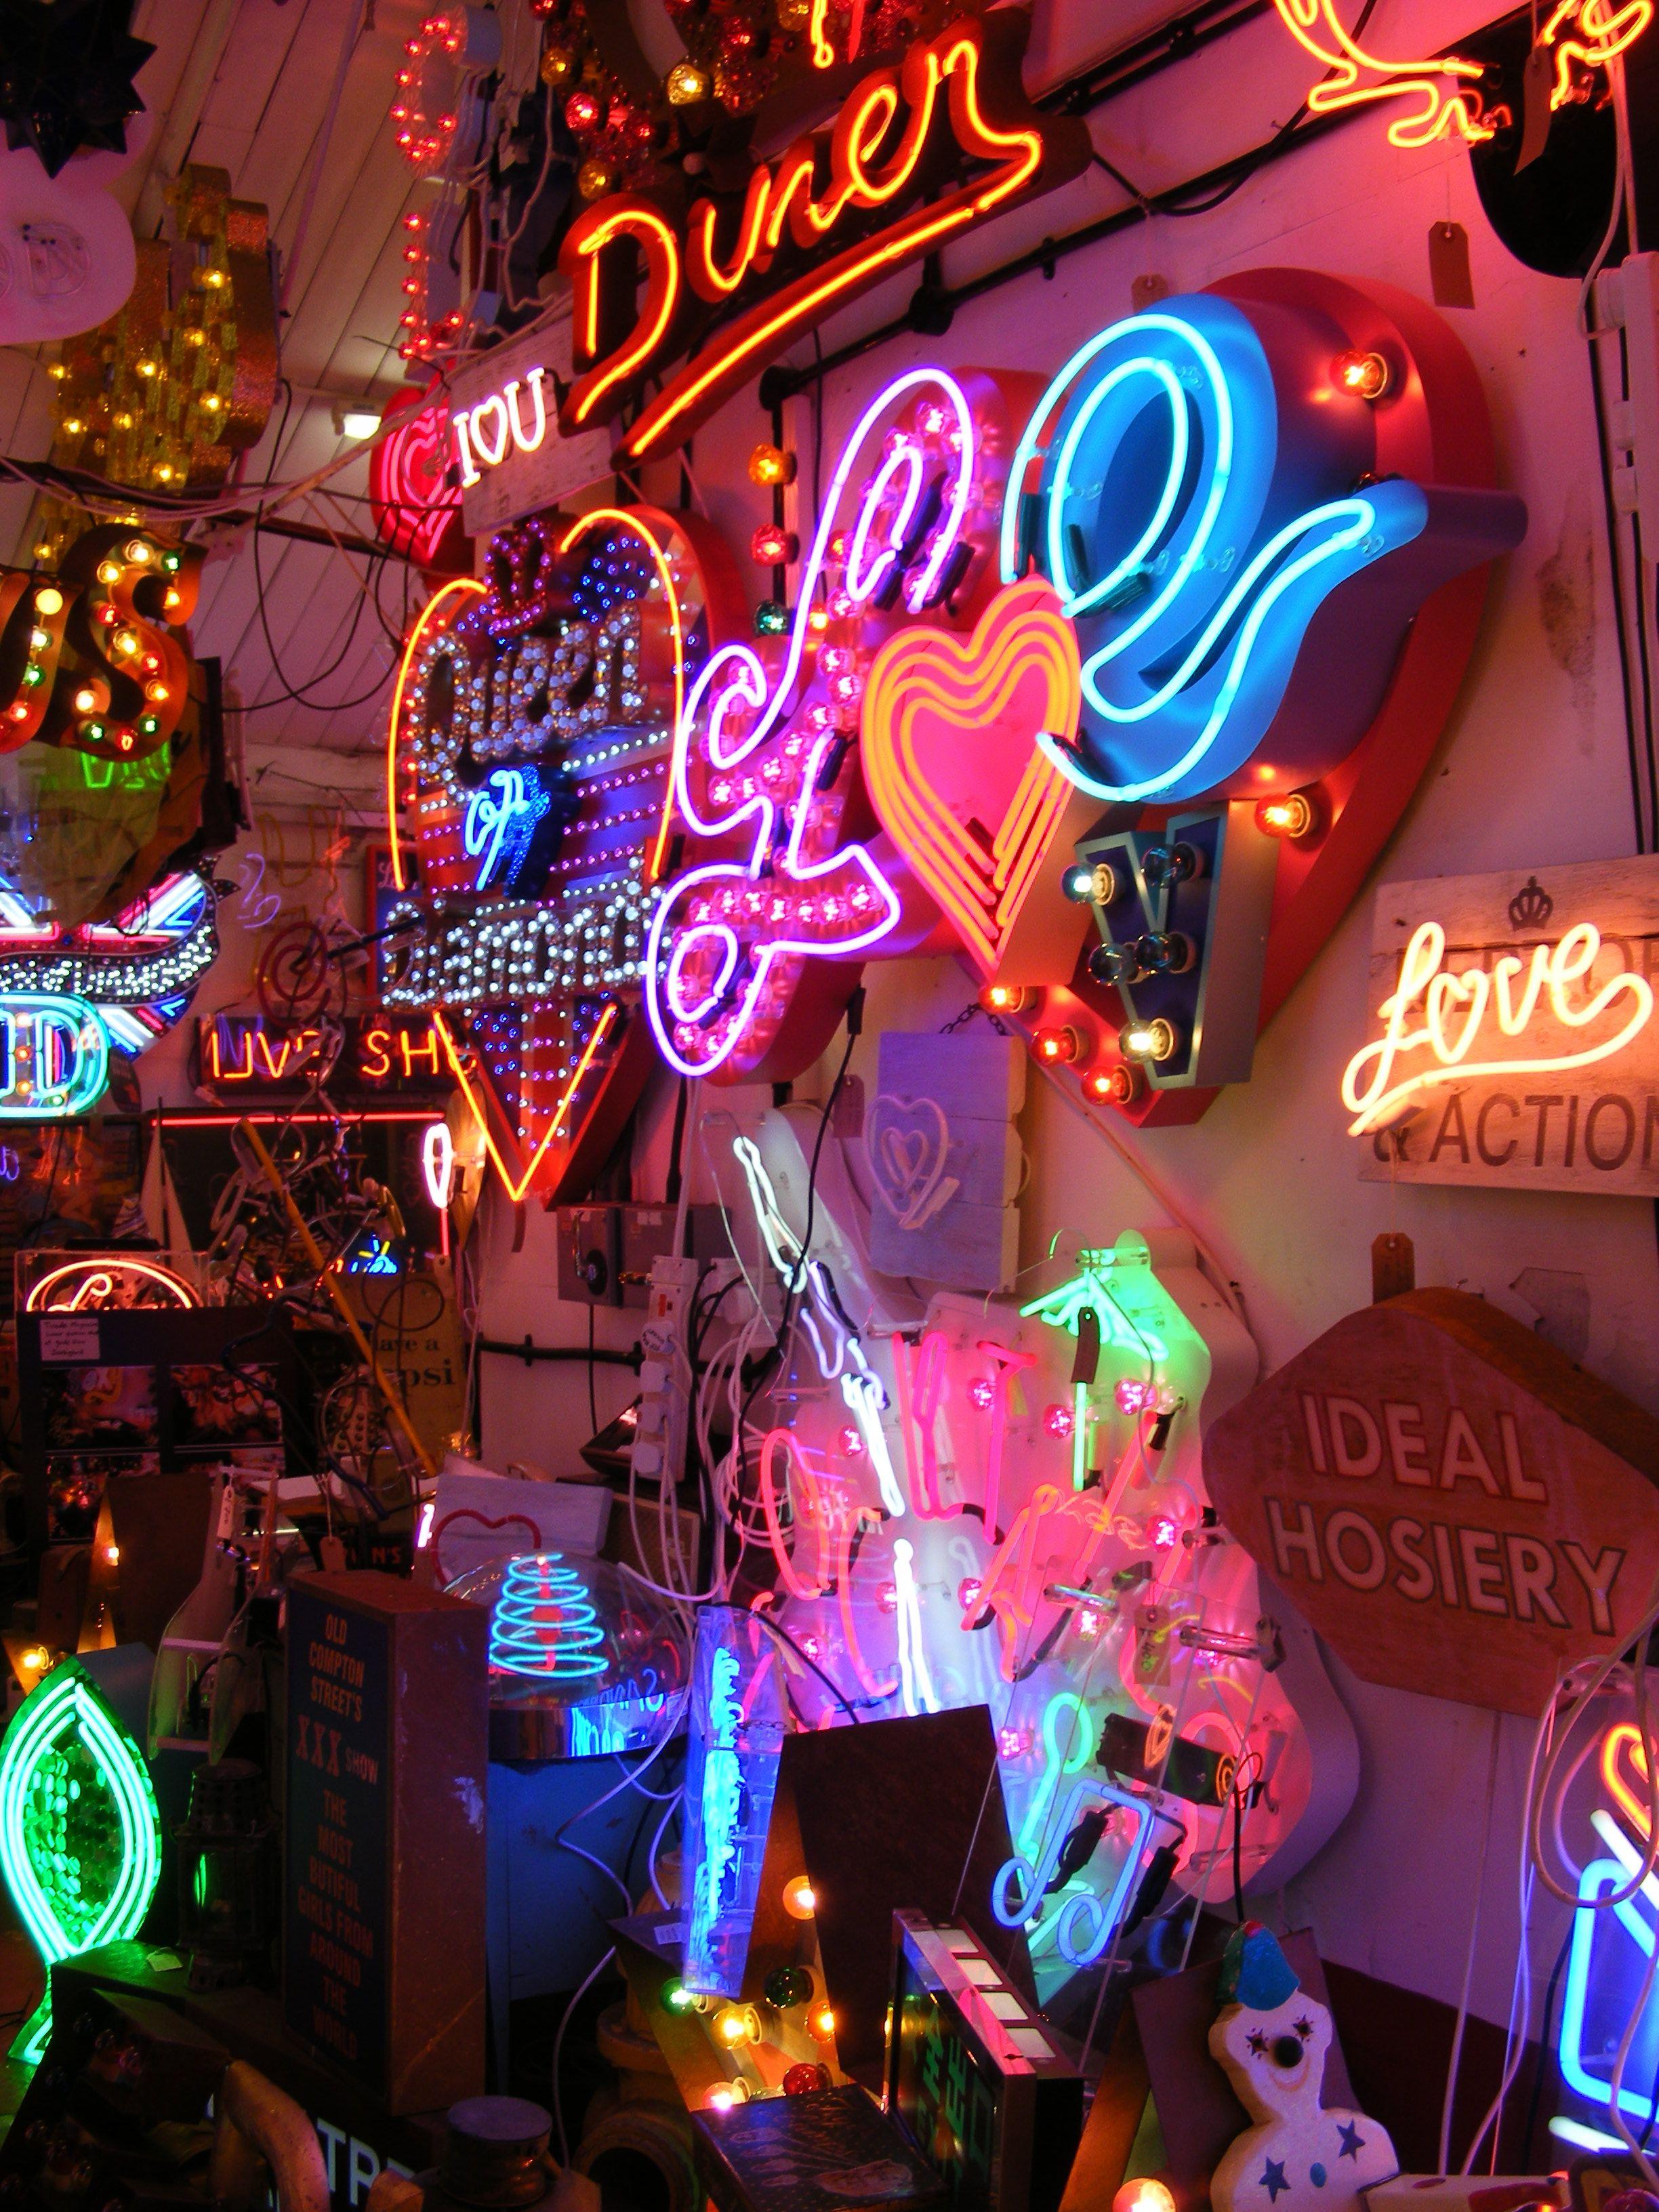 Gods own junkyard neon signs neon glow neon aesthetic